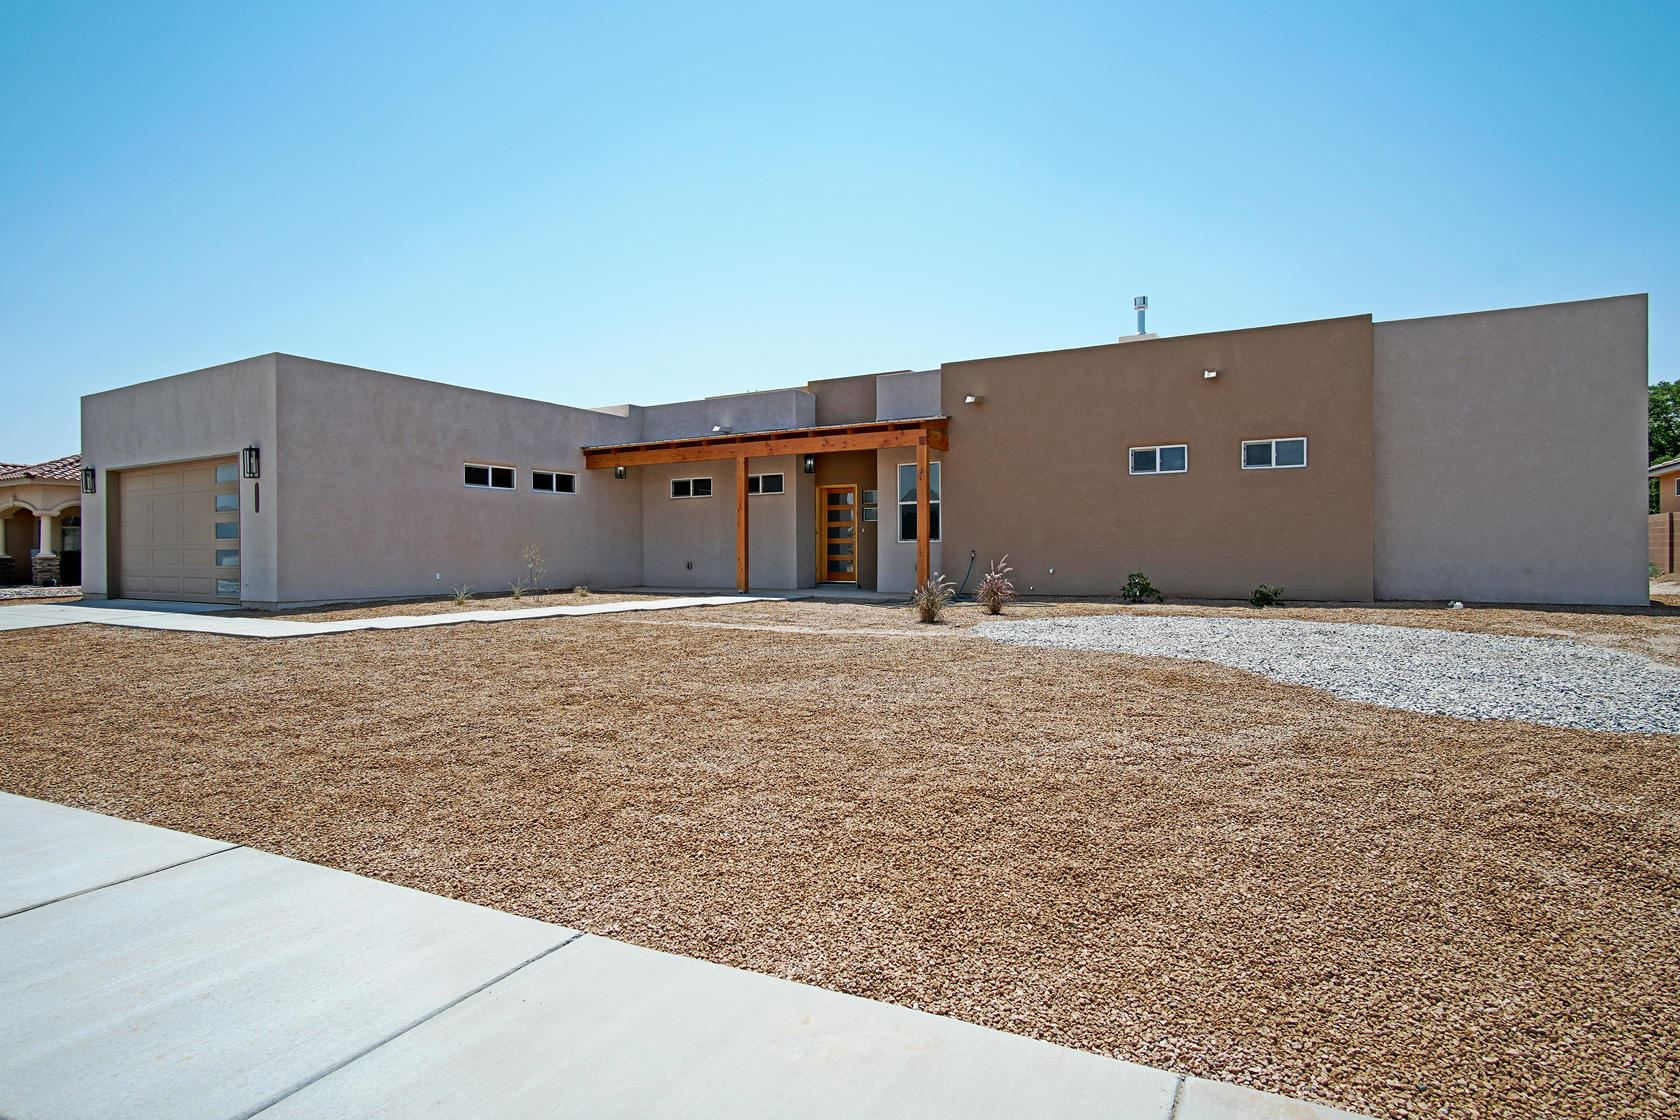 Photo of 5327 Susy Street SW, Albuquerque, NM 87105 (MLS # 994726)